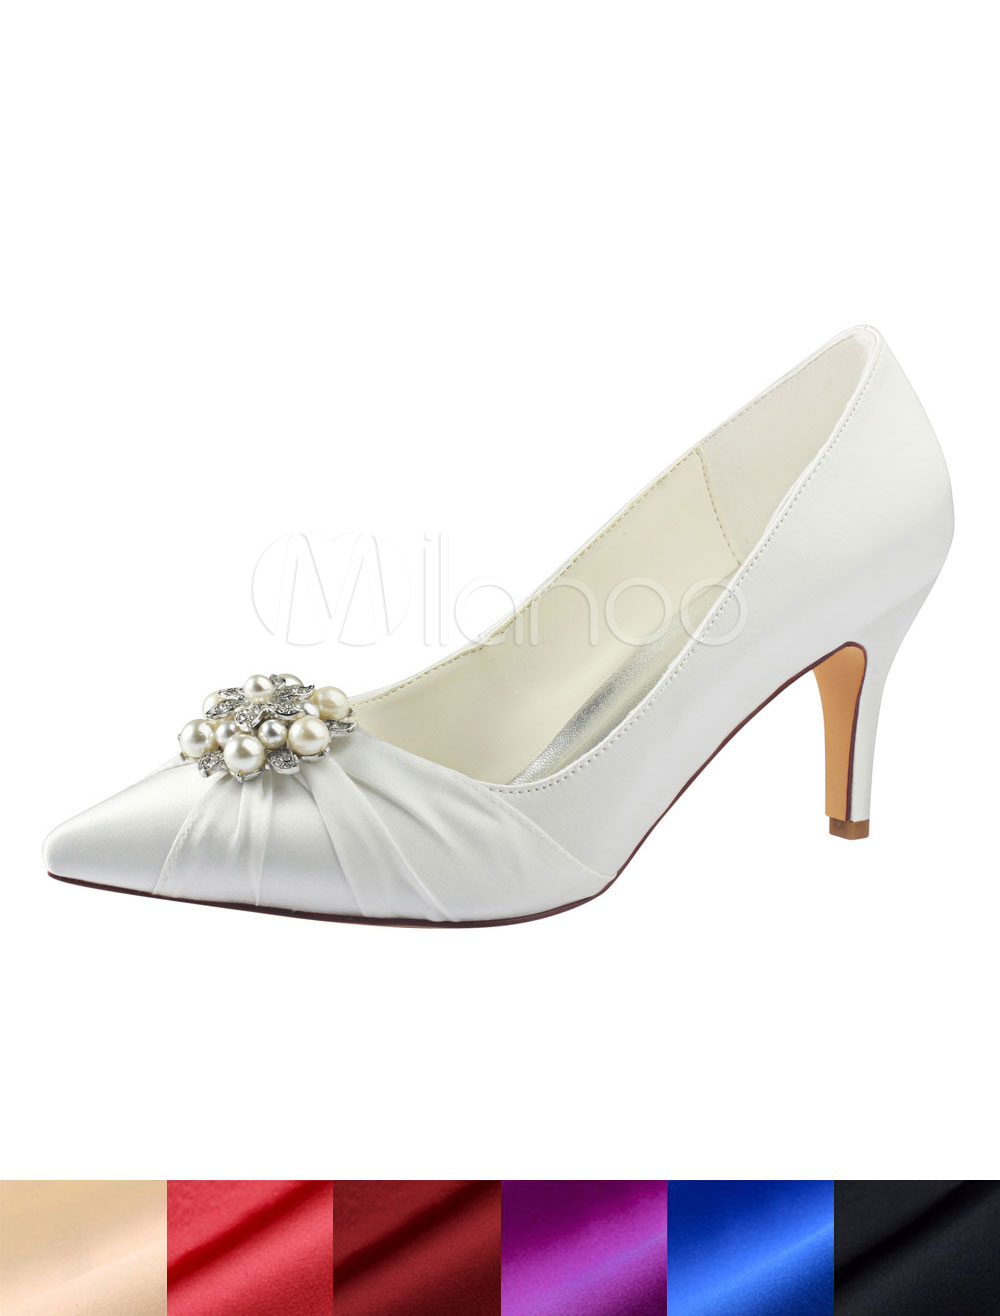 c438a68ae0f Ivory Wedding Shoes Silk Pointed Toe Pearls Rhinestones High Heel Bridal  Shoes